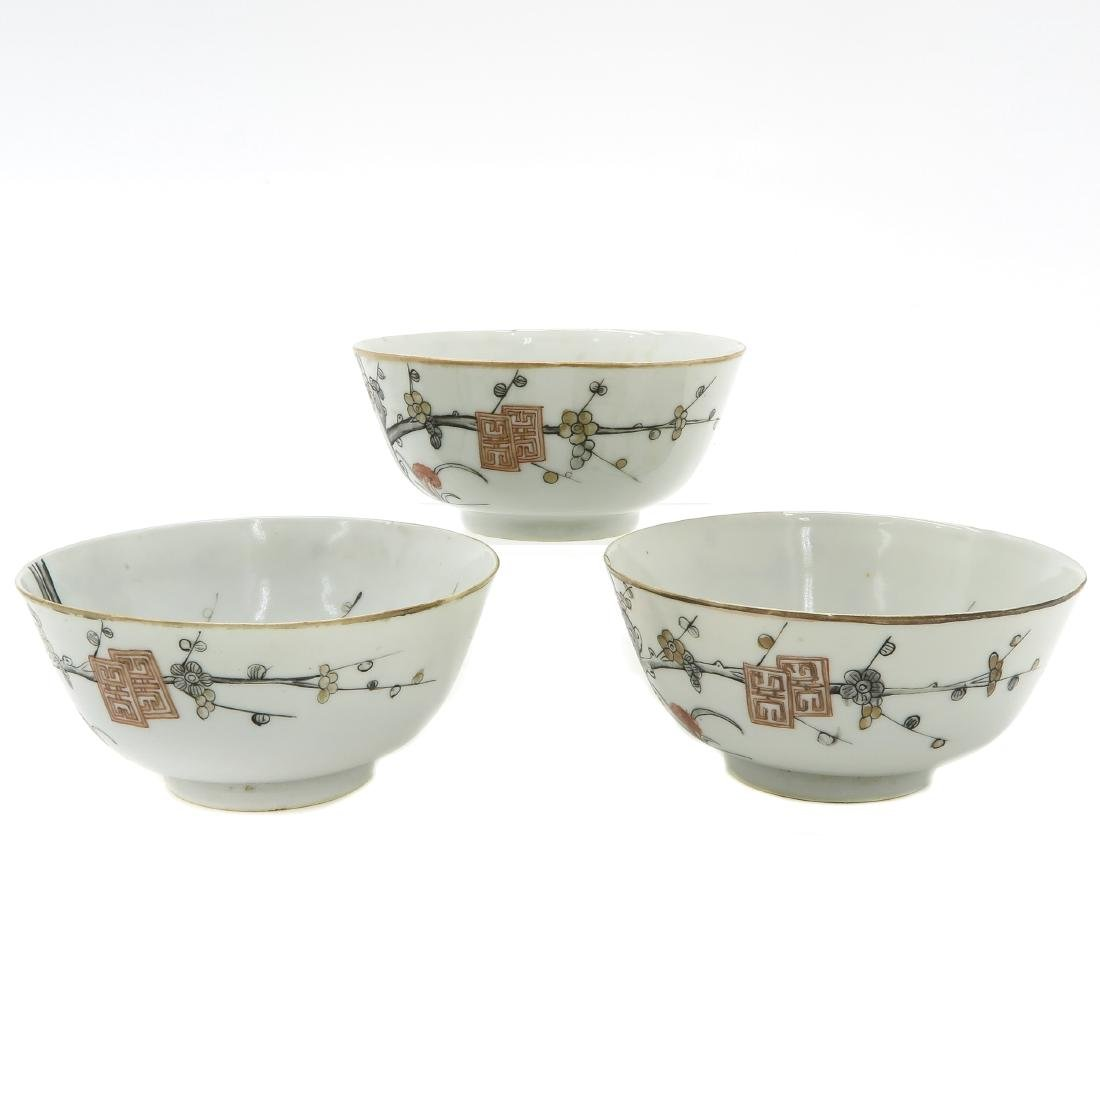 Lot of 3 Bowls - 2